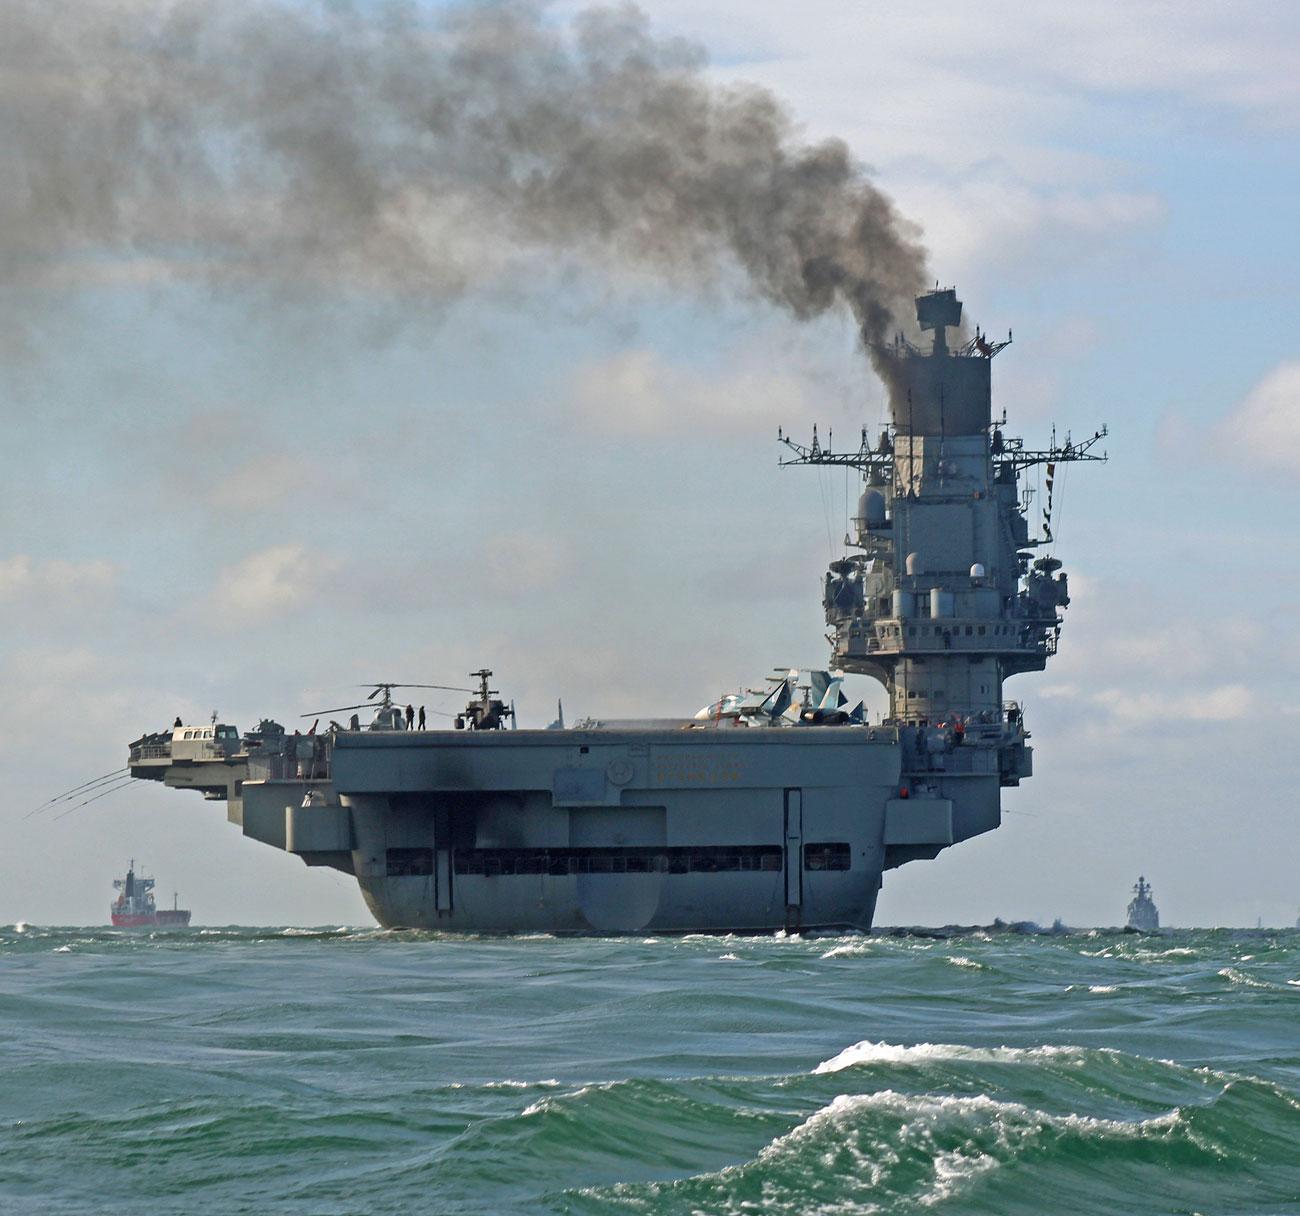 Laksamana Kuznetsov adalah kapal induk yang pertama kali diluncurkan pada 1985 dan merupakan unggulan Angkatan Laut Rusia.